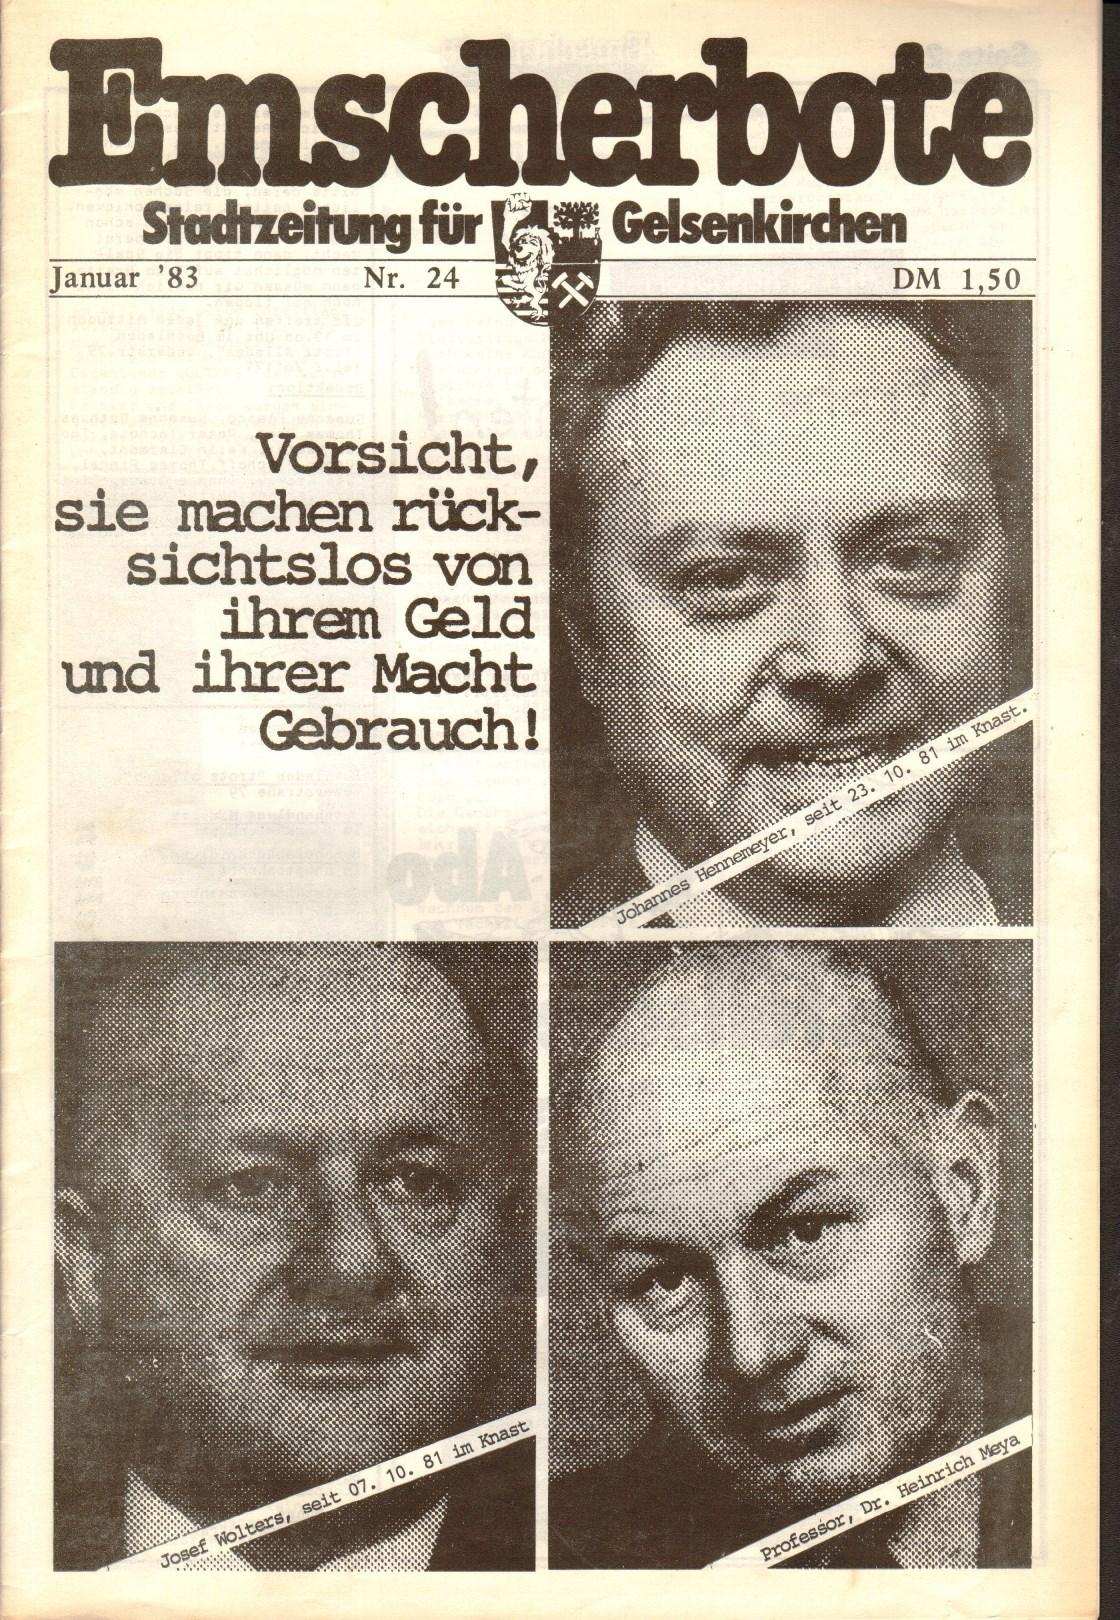 Gelsenkirchen_Emscherbote_1983_24_01